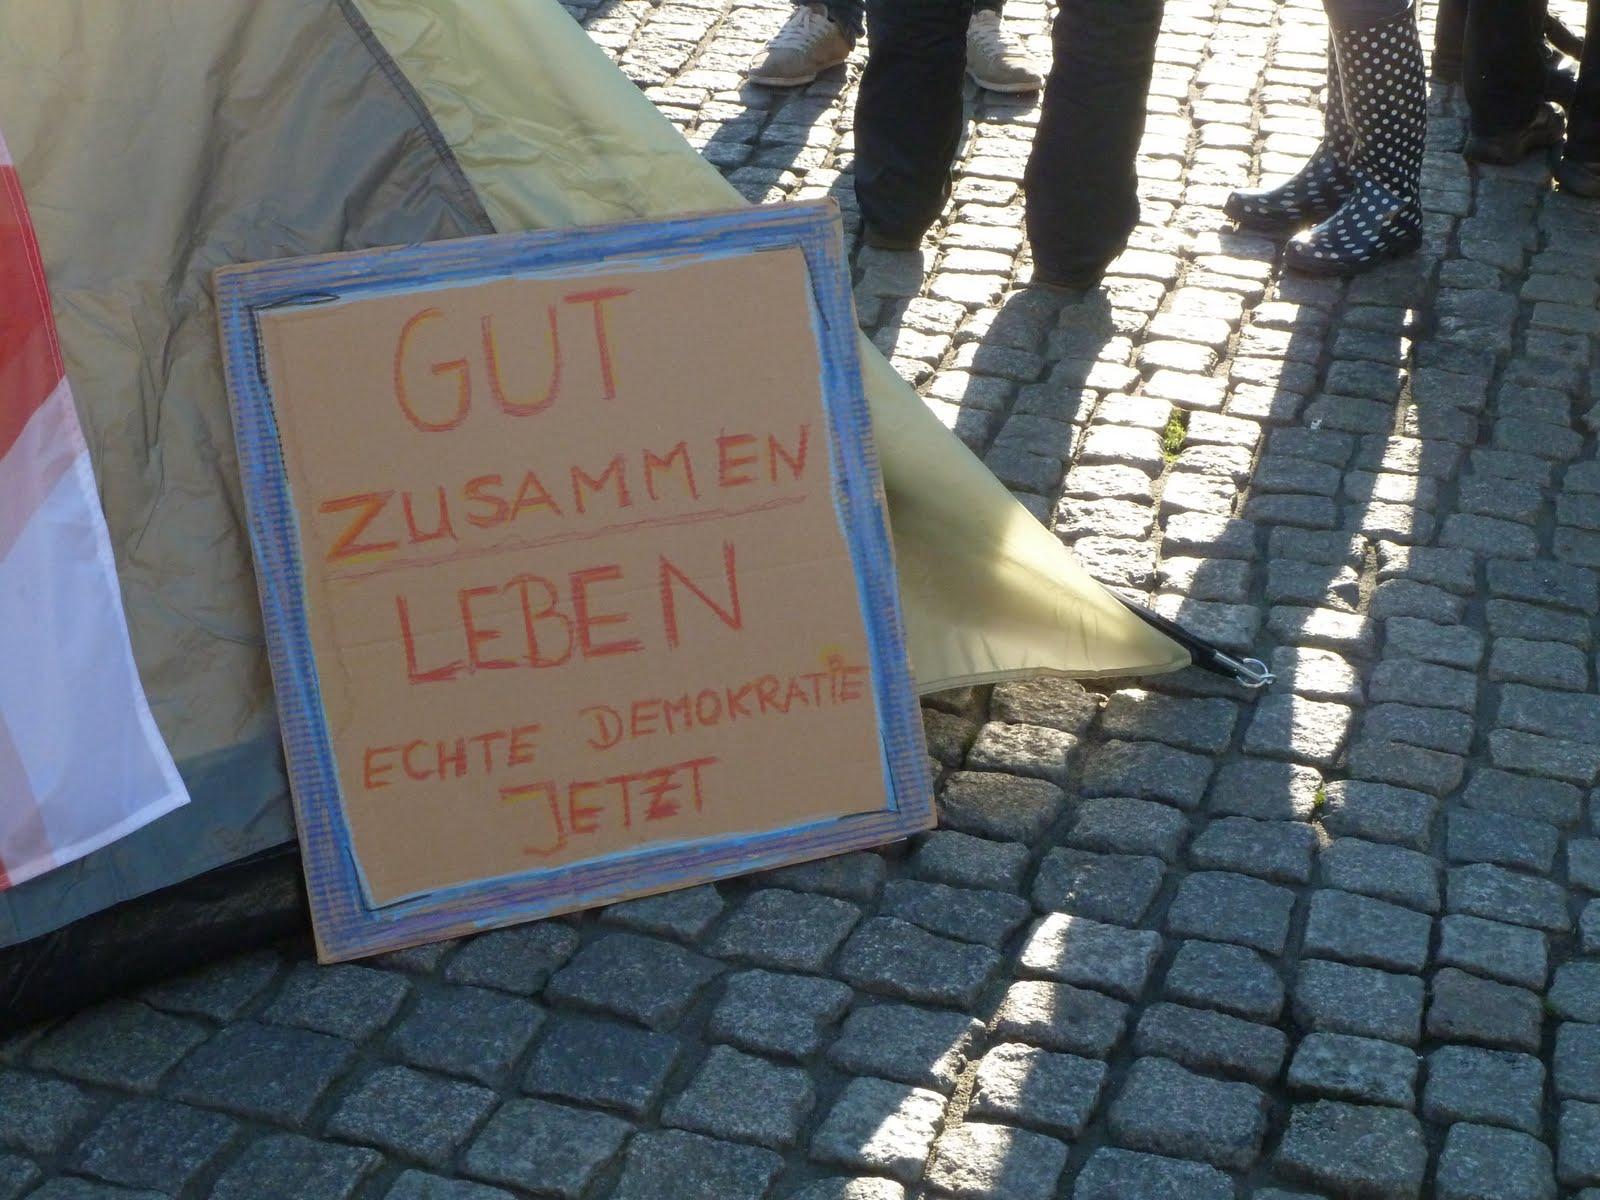 15.10.11 in Greifswald